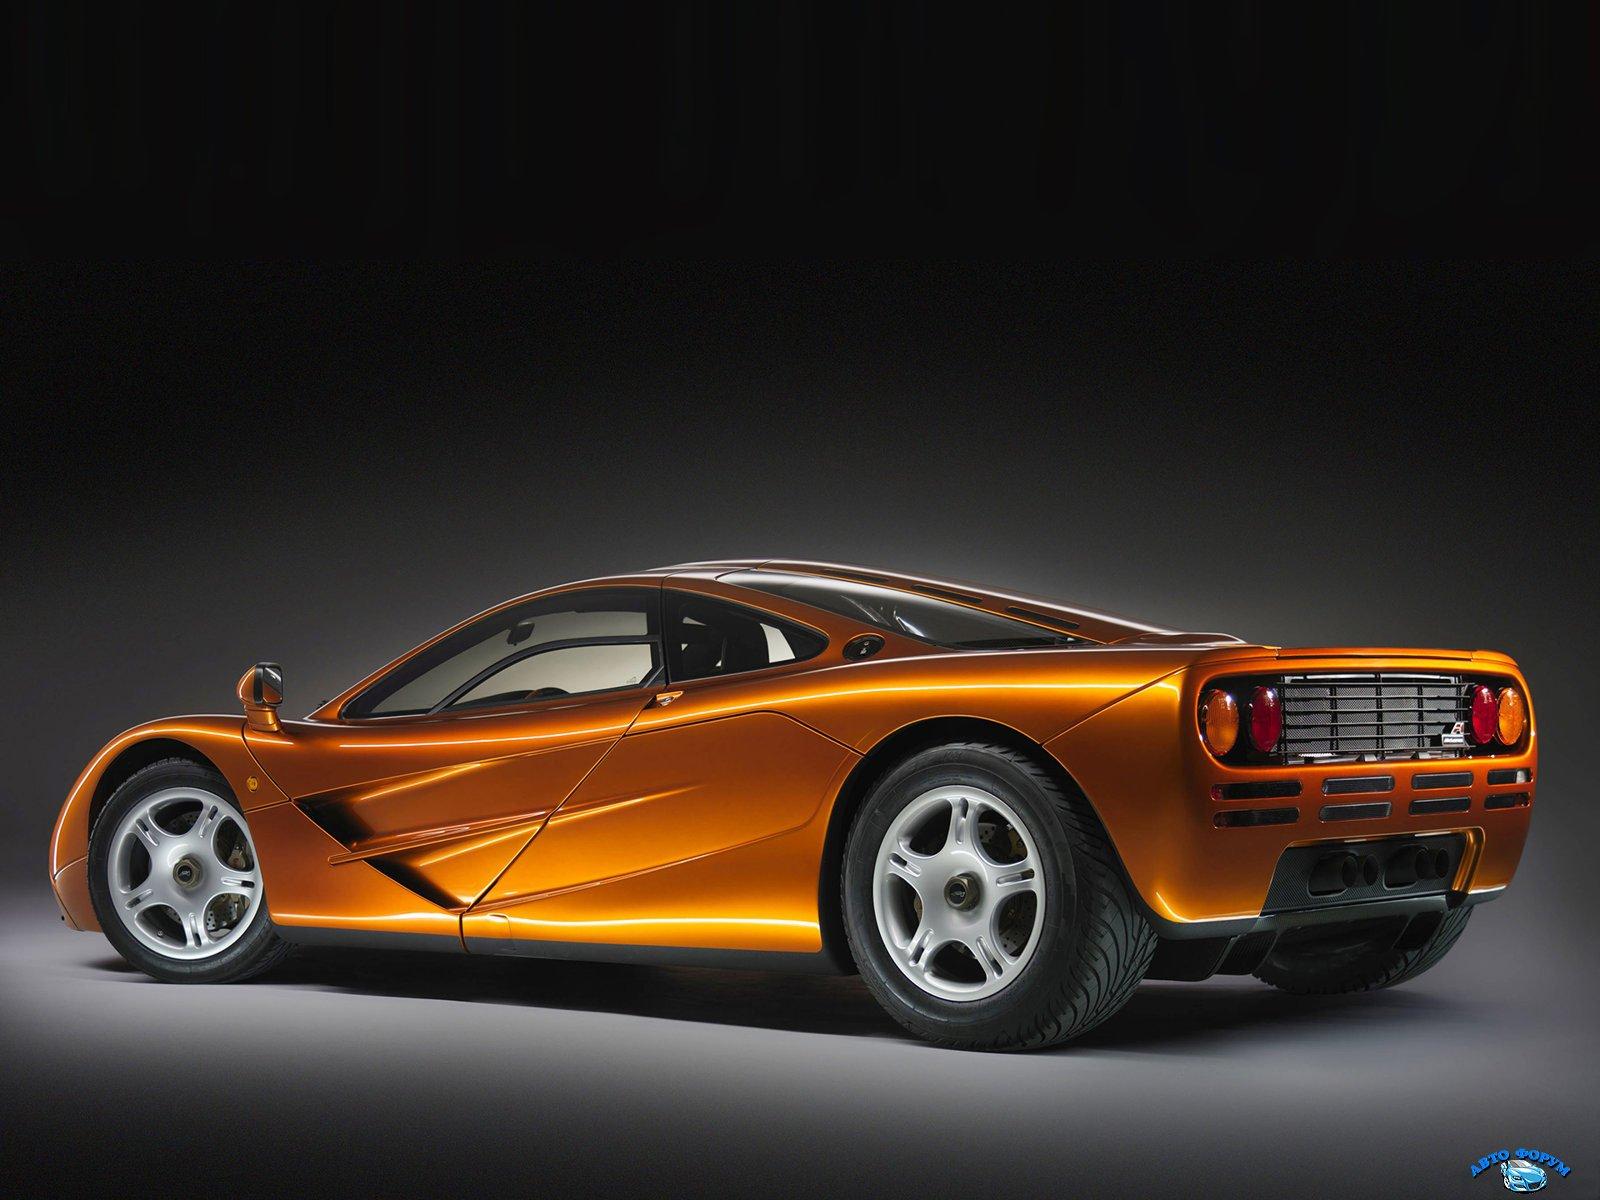 McLaren-F1_1993_4.jpg